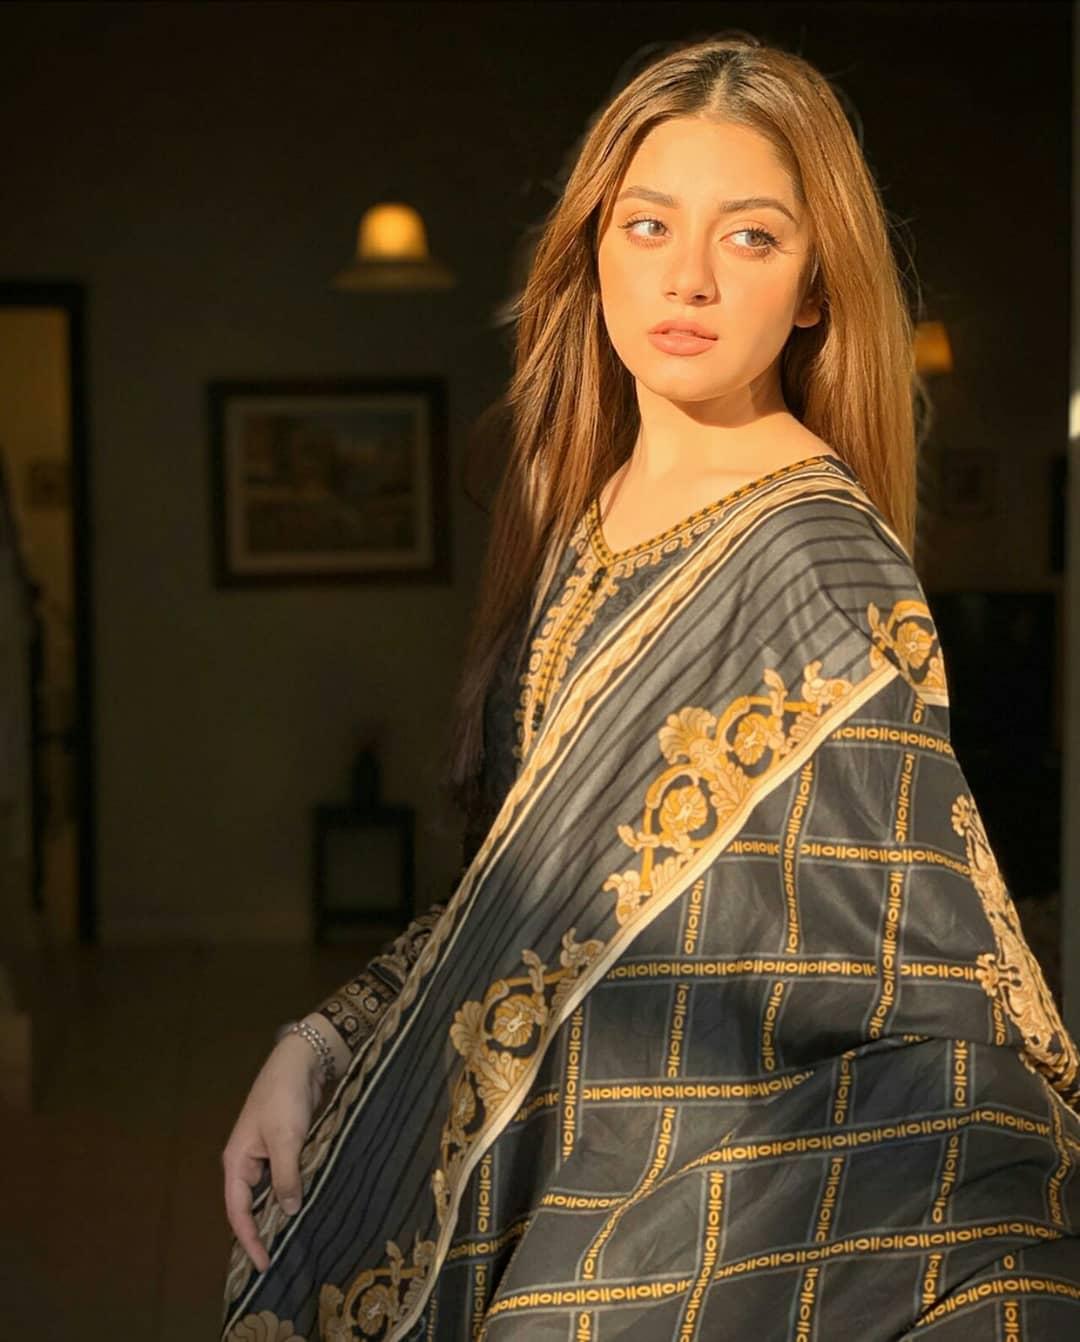 Beautiful Clicks from the Set of Drama Mera Dil Mera Dushman